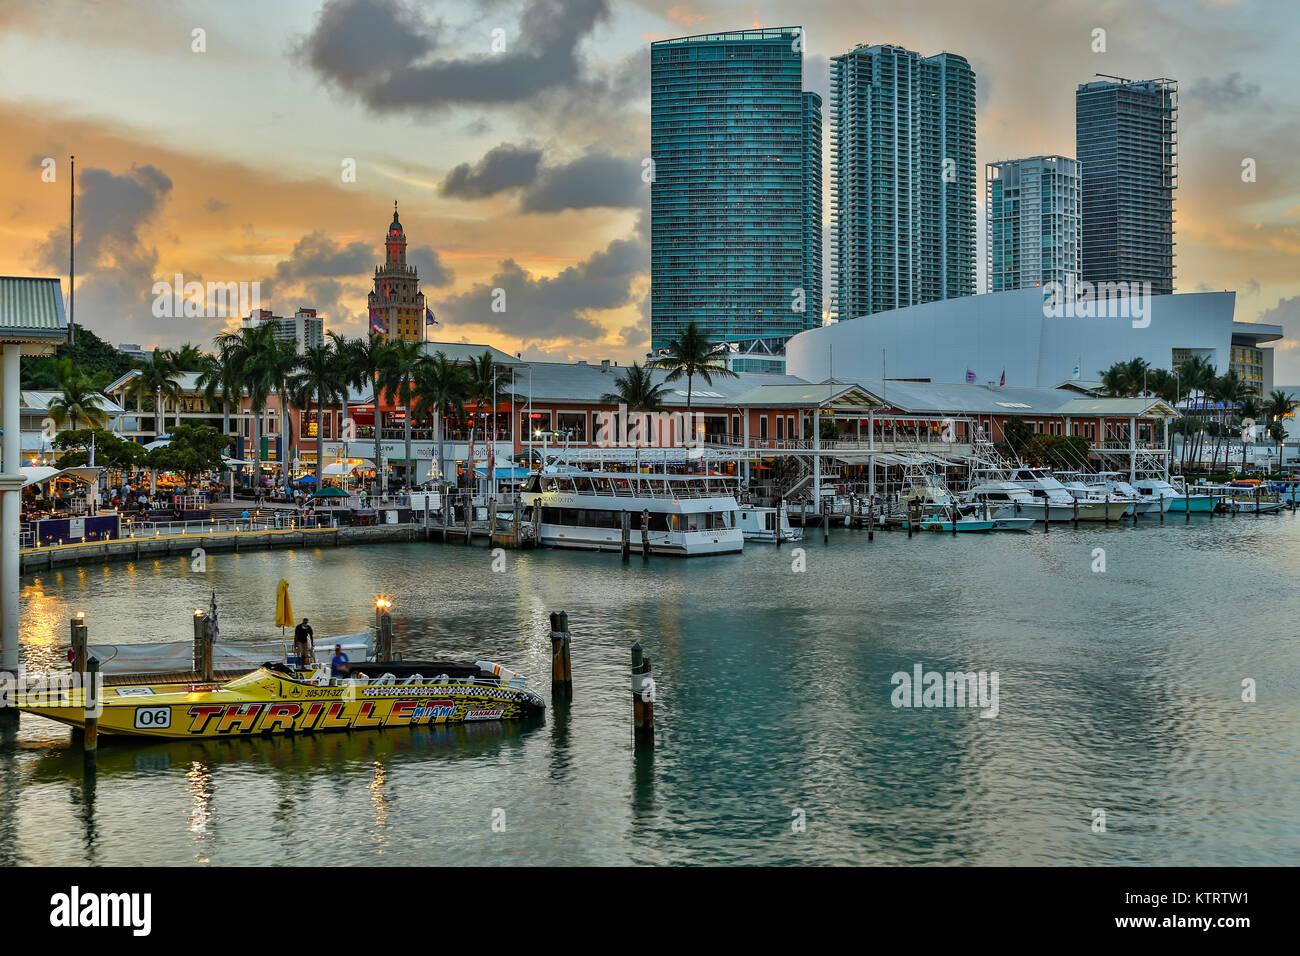 Marina at Bayfront Marketplace and skyscrapers, Miami, Florida USA Stock Photo